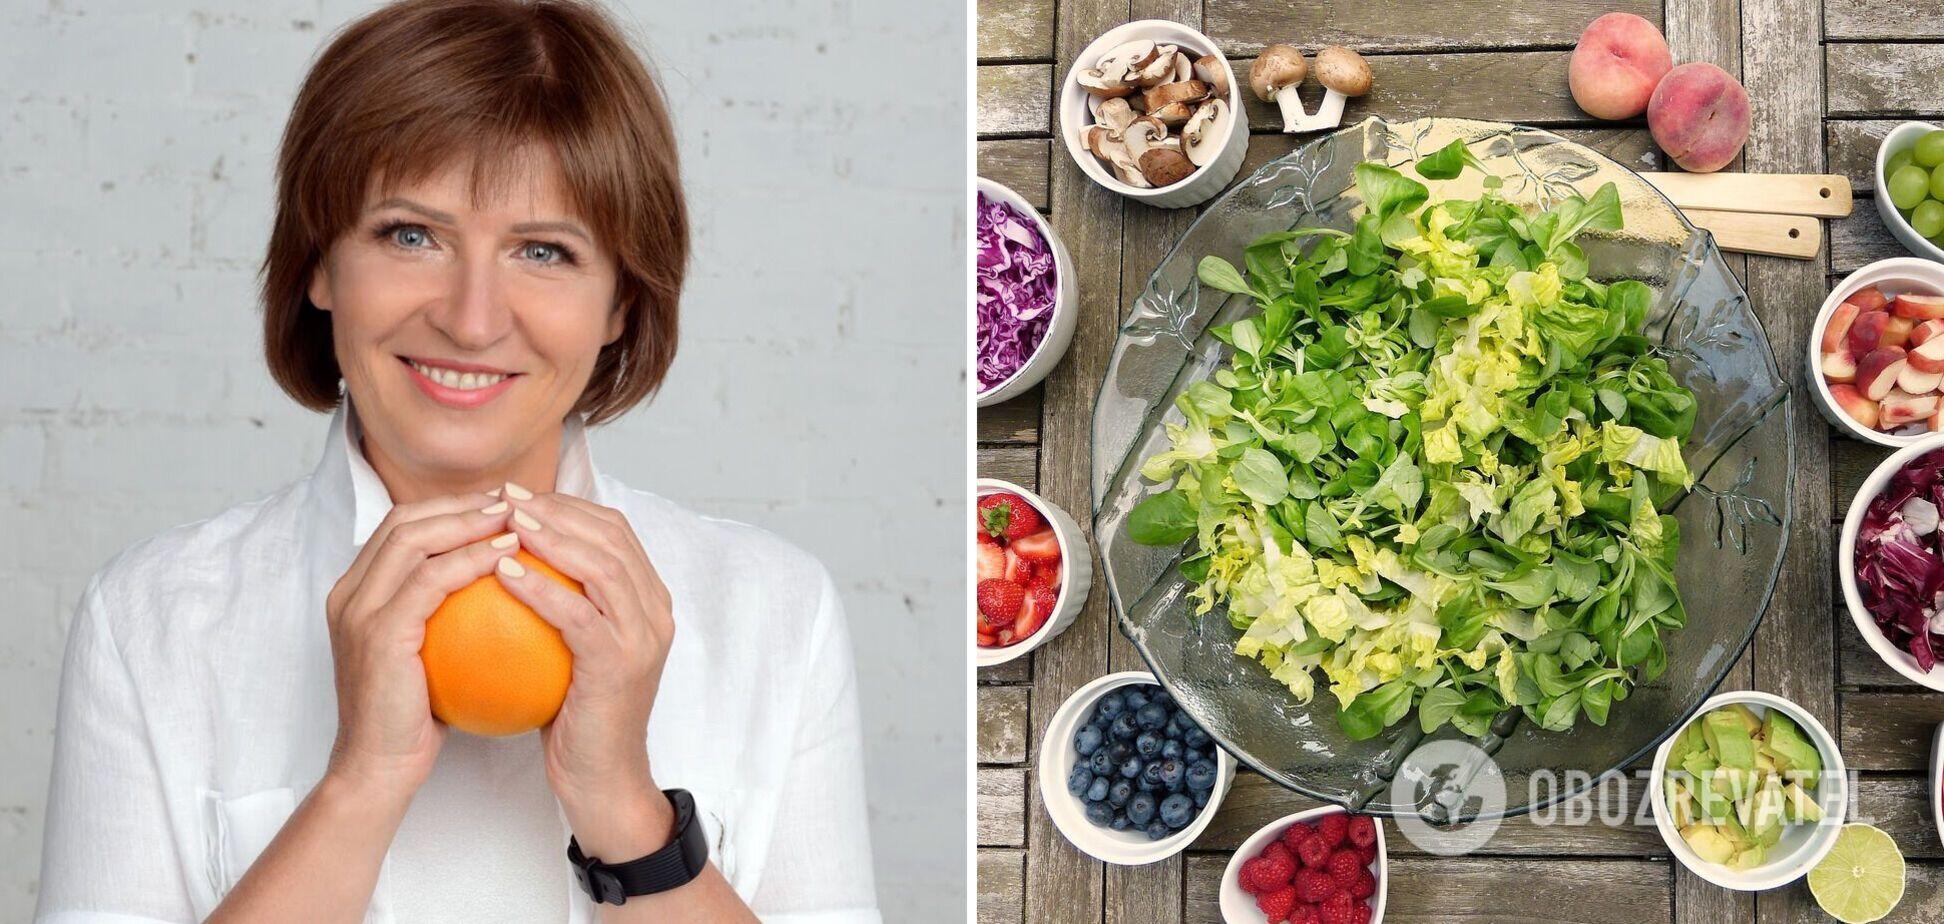 Світлана Фус назвала продукти-антиоксиданти